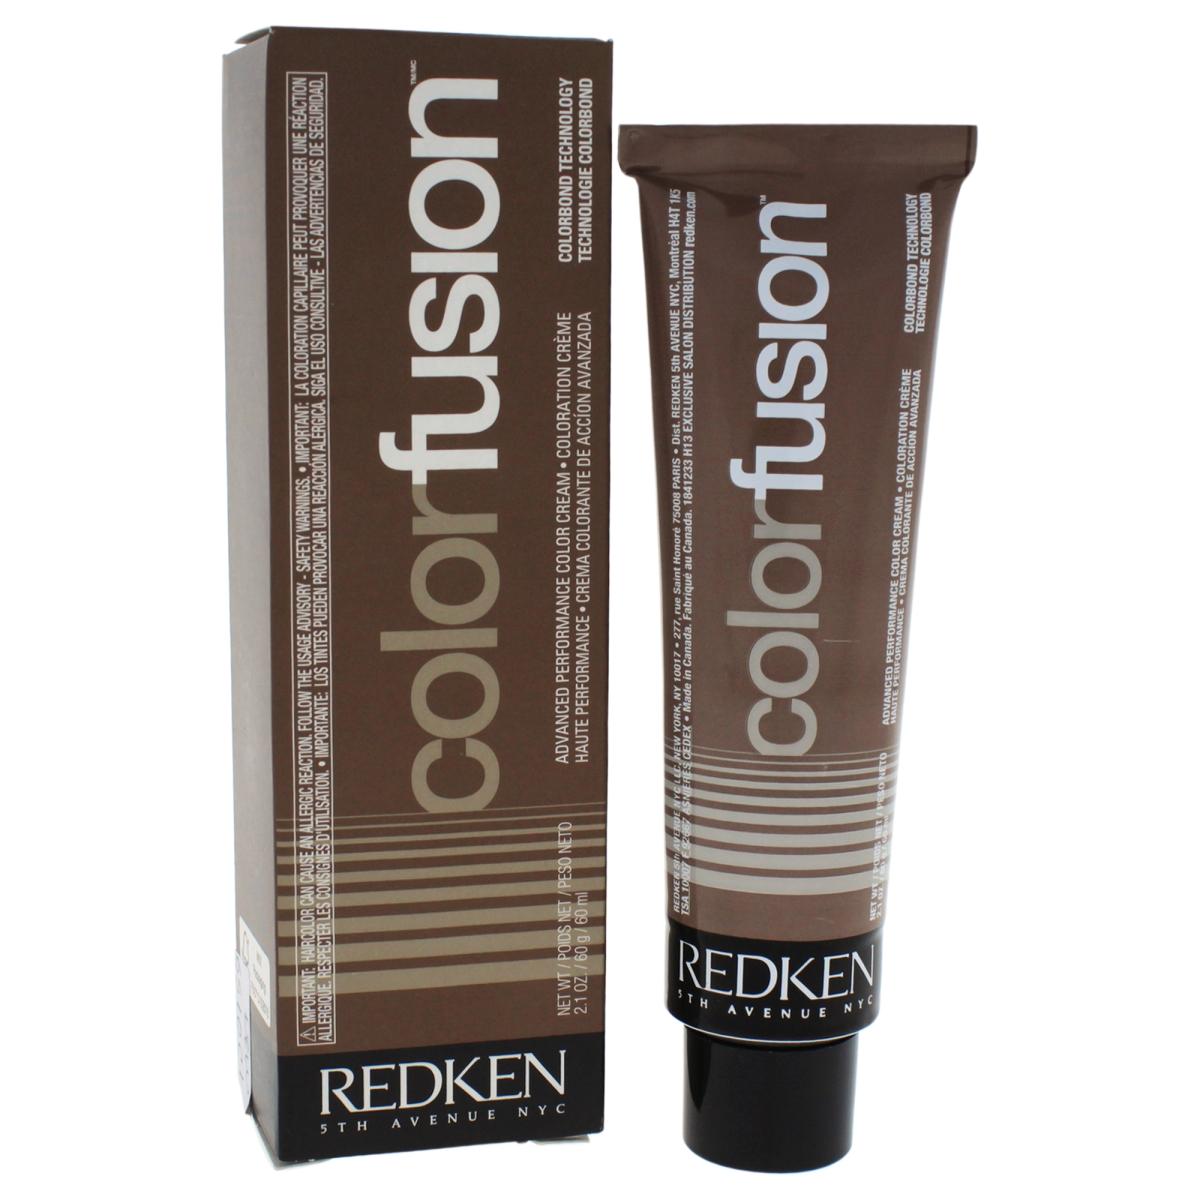 Redken U-HC-11728 2.1 oz Color Fashion Cram Natural Fashion No. 7 Hair Color for Unisex Ash Green